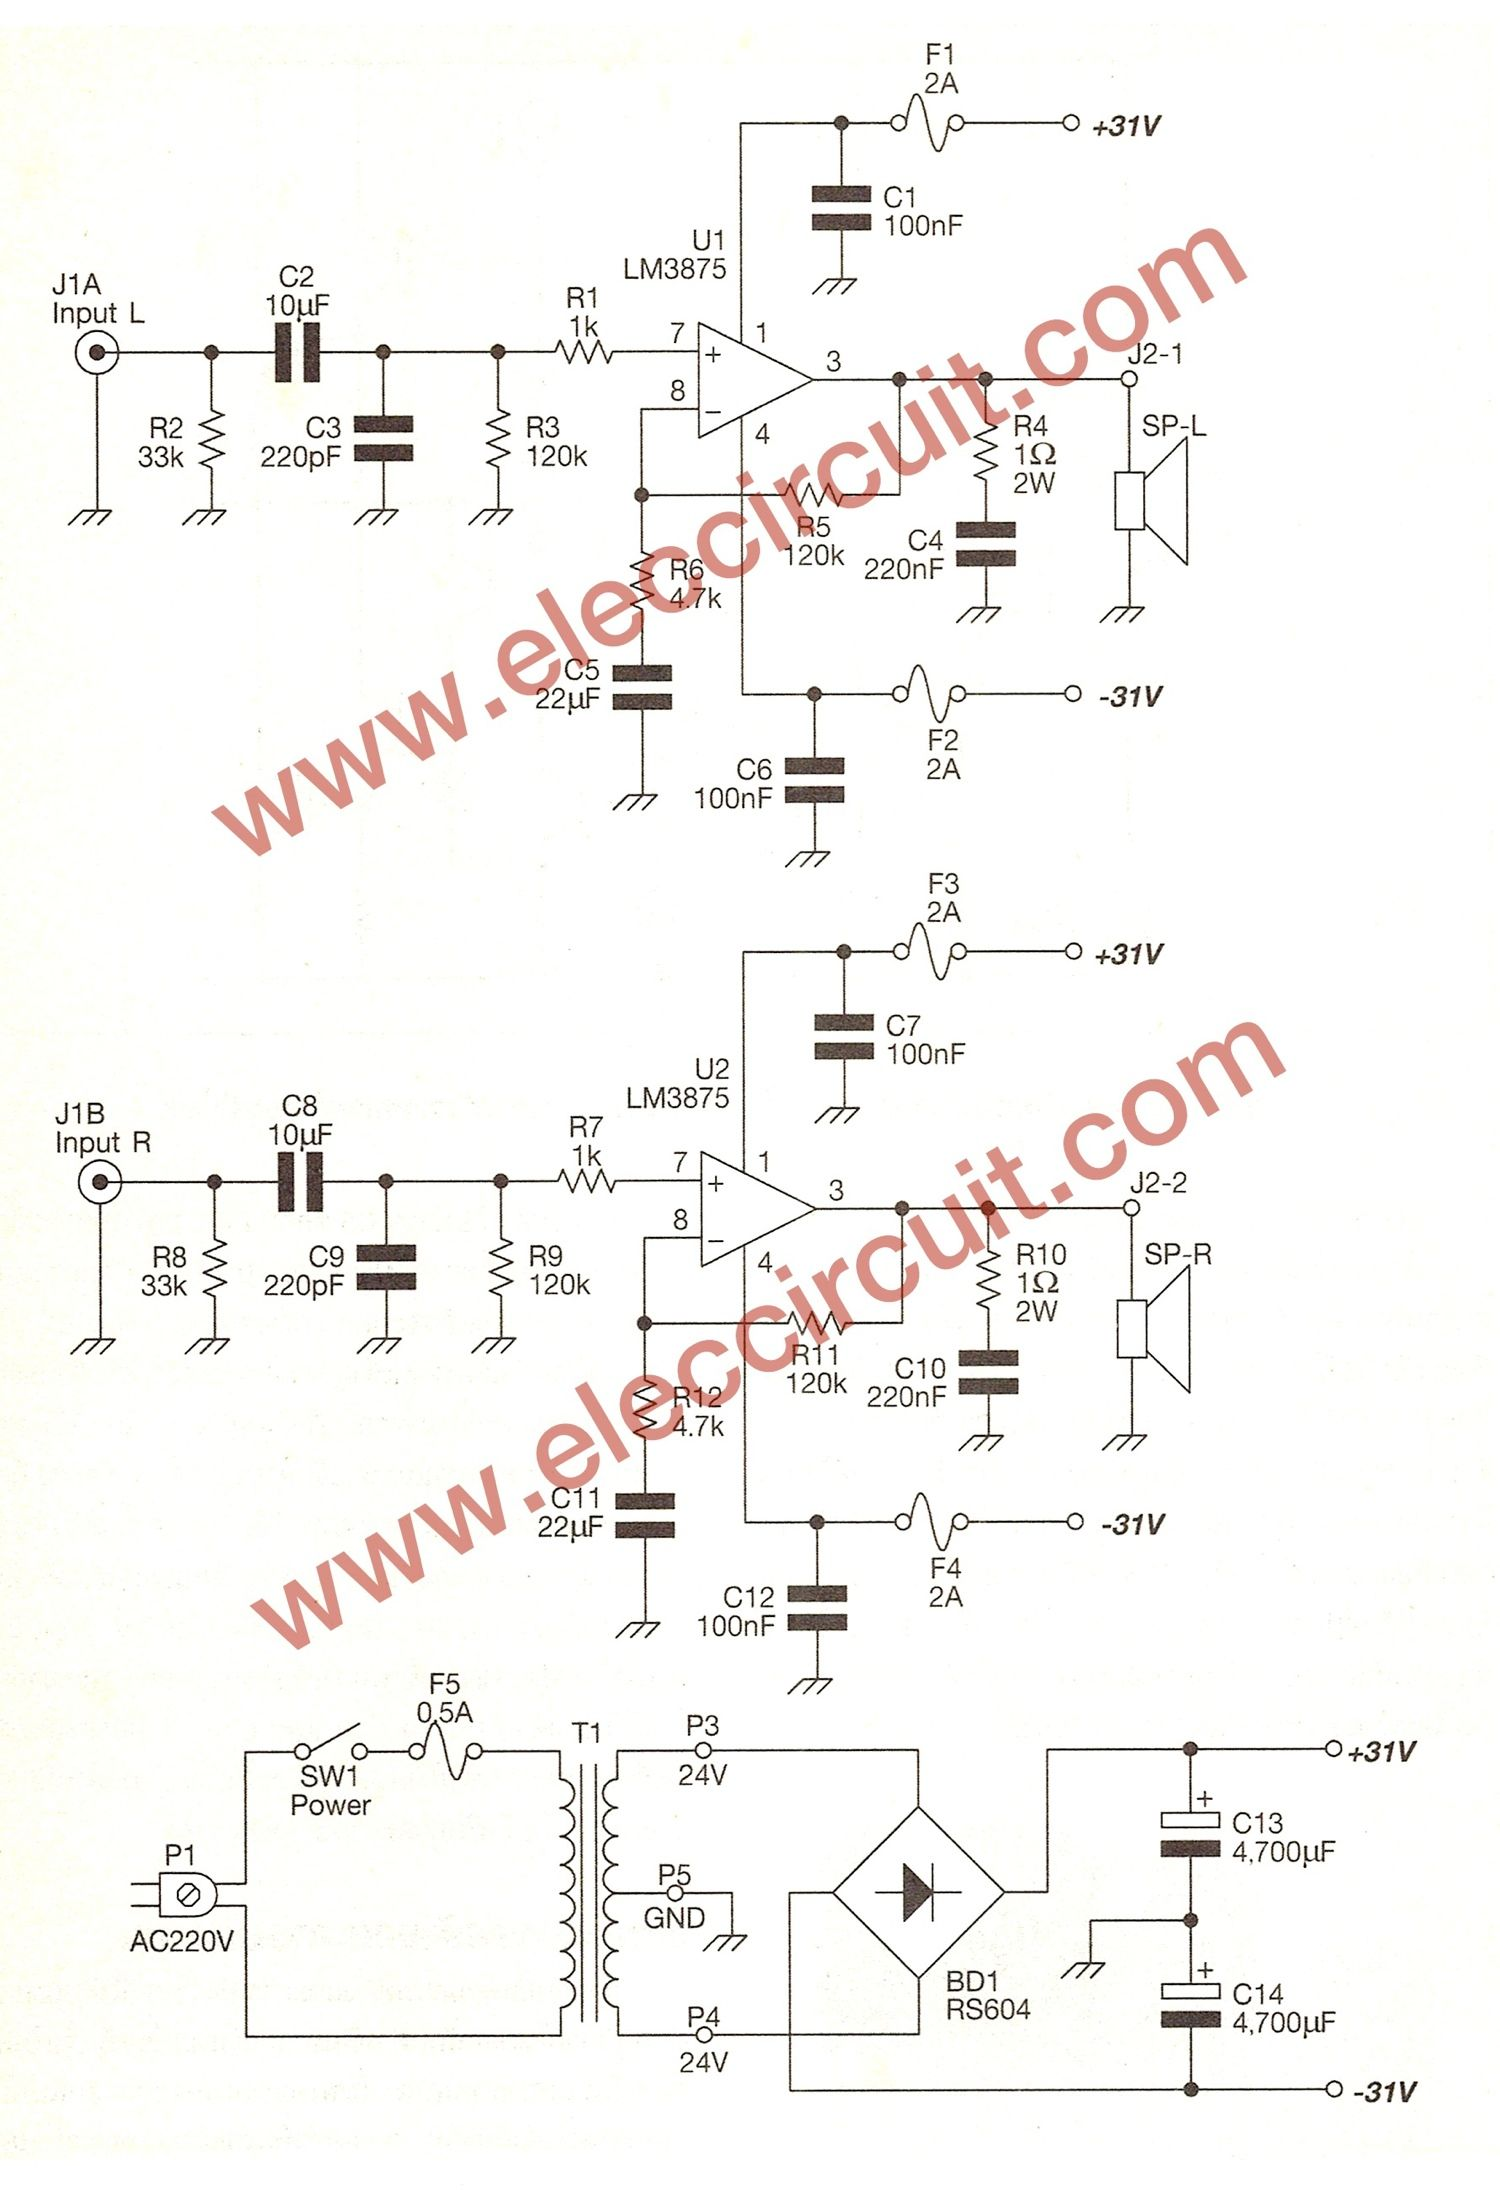 gainclone amplifier circuit stereo 40w using lm3875 eleccircuit amplifier tda2030tda2030 circuitcircuit diagram 14w hifi audio [ 1500 x 2190 Pixel ]